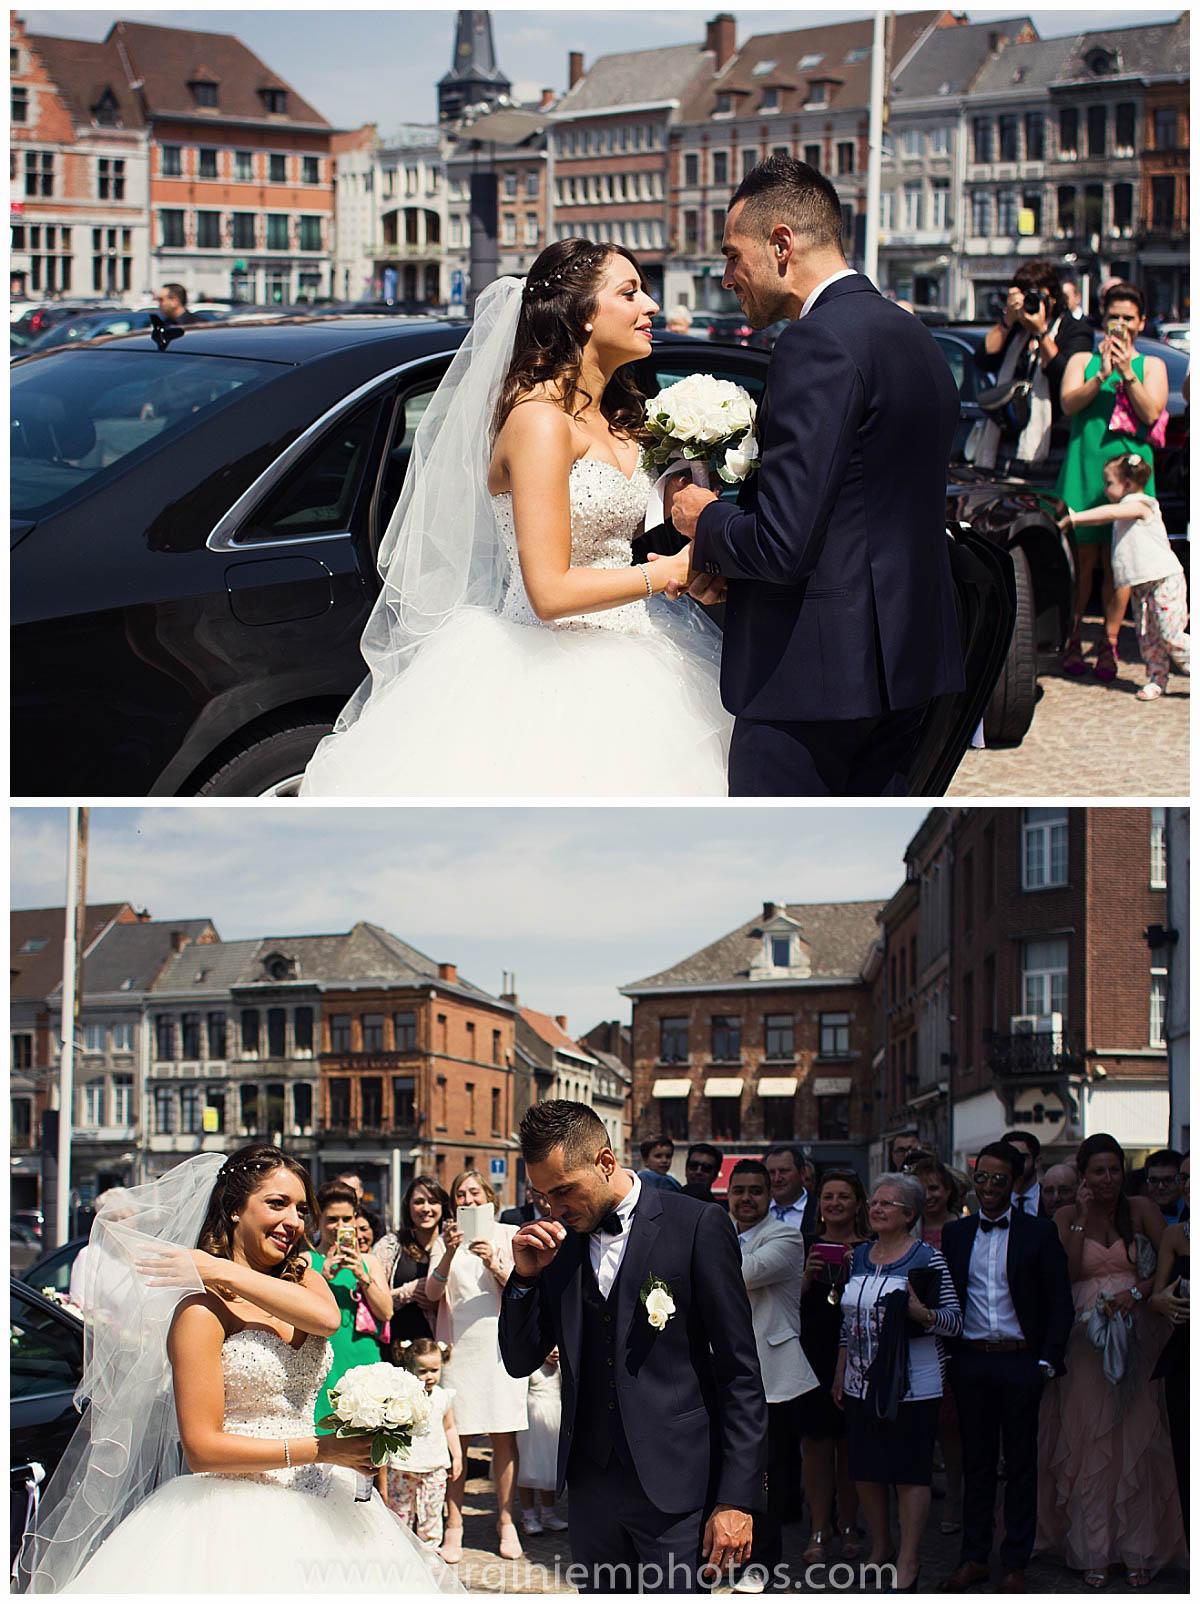 Virginie M. Photos-photographe mariage nord-Mairie (4)